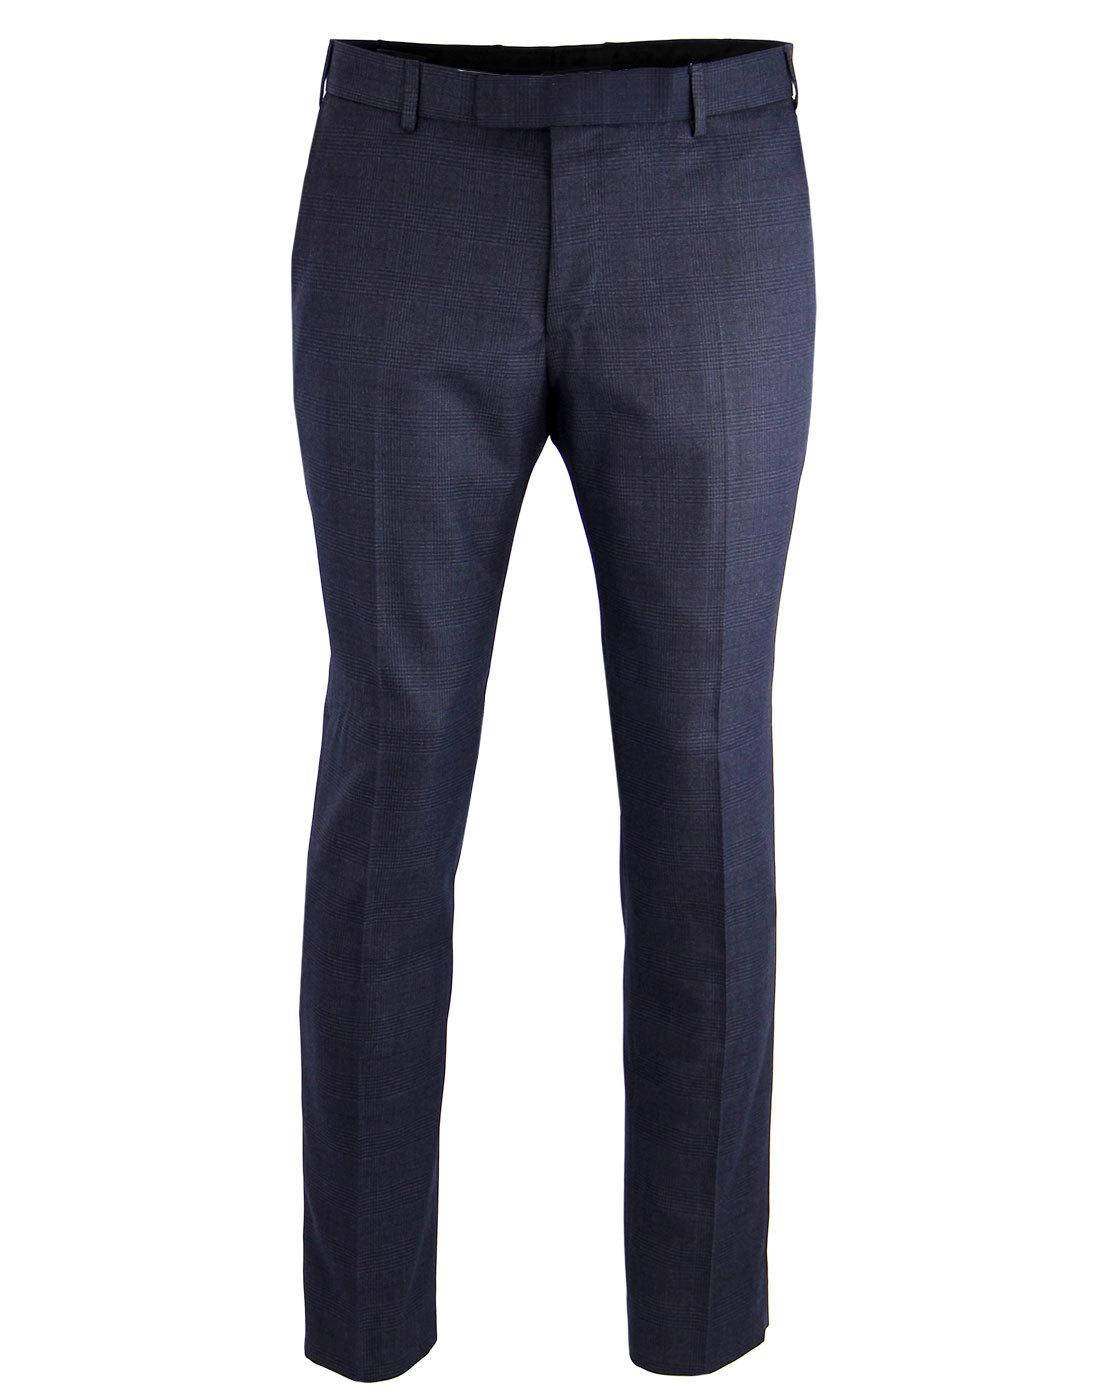 MADCAP ENGLAND Mod Check Retro Slim Fit Trousers